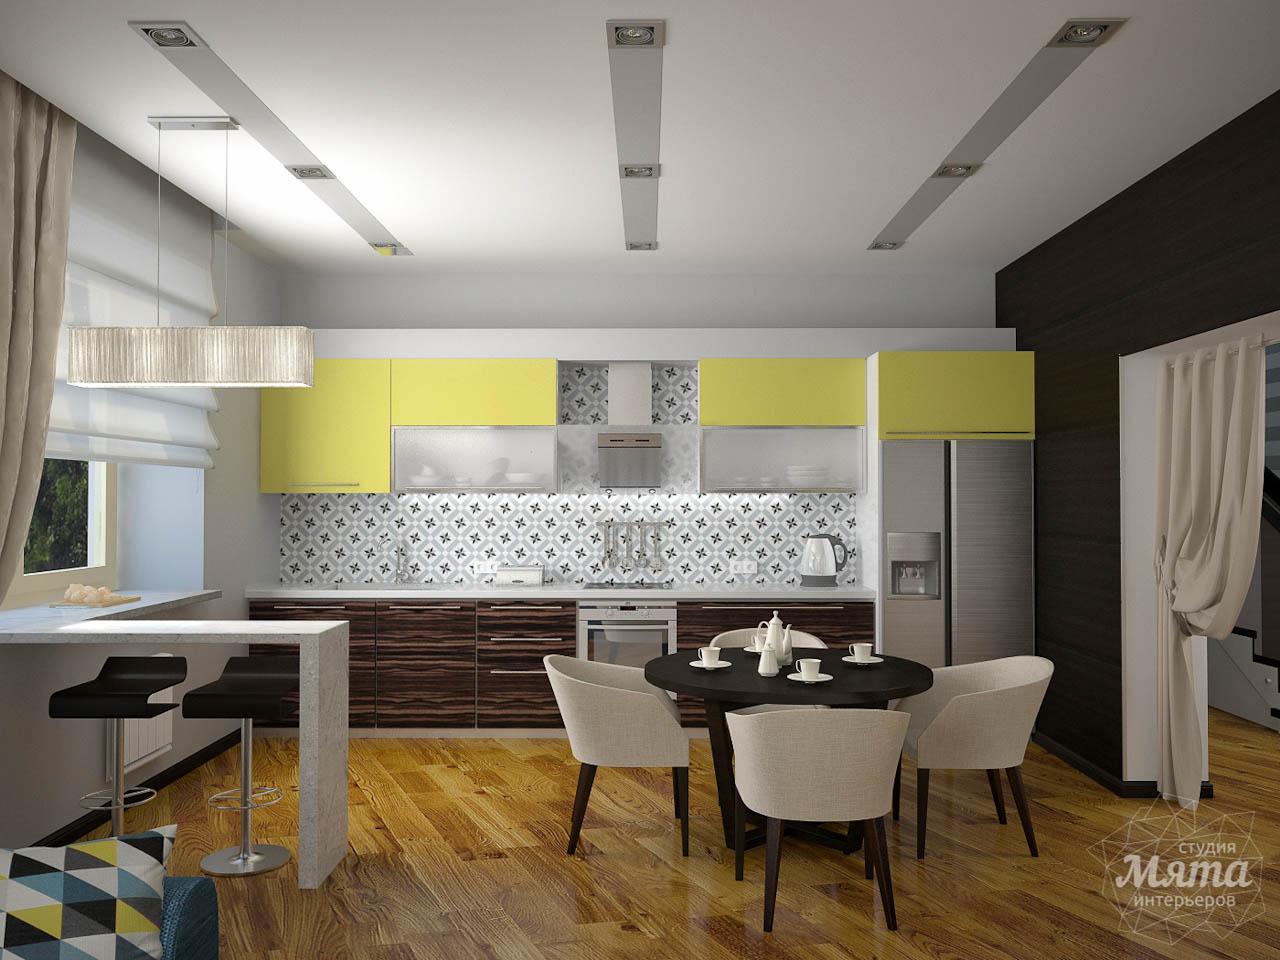 Дизайн проект интерьера коттеджа  в стиле минимализм по ул. Барвинка 15 img267446141